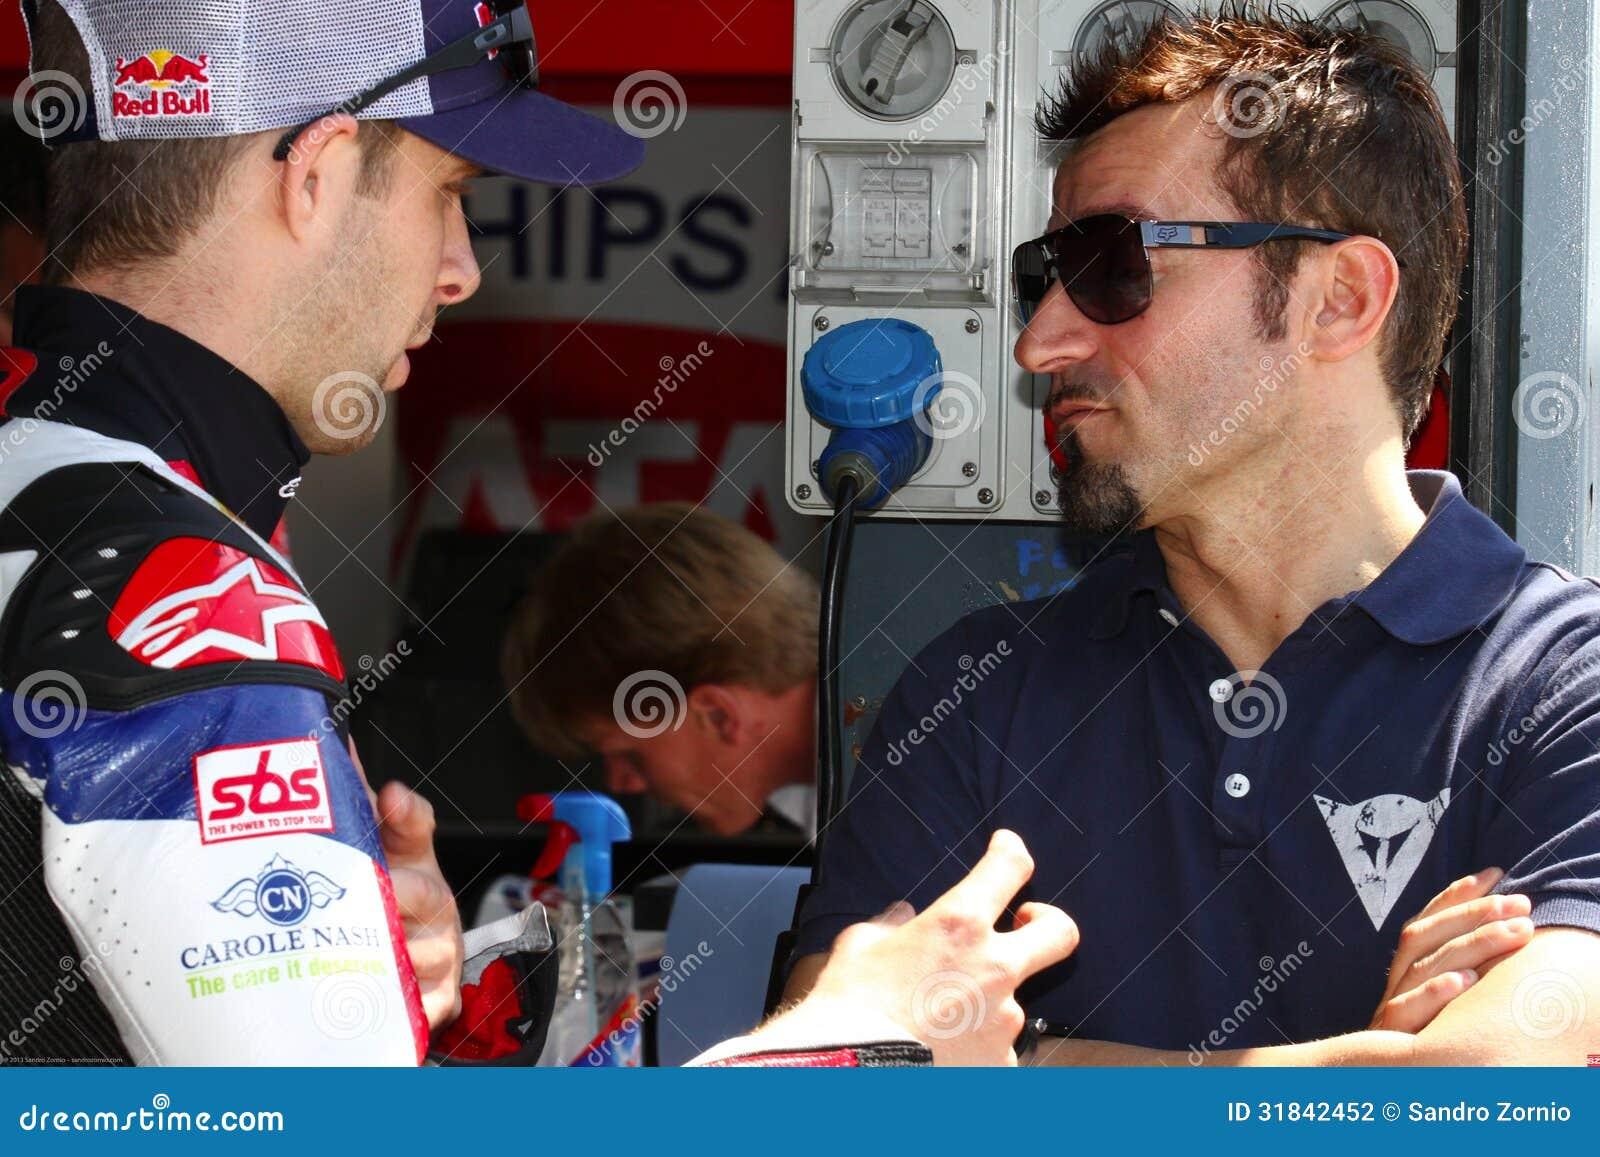 Jonathan Rea #65 and Max Biaggi